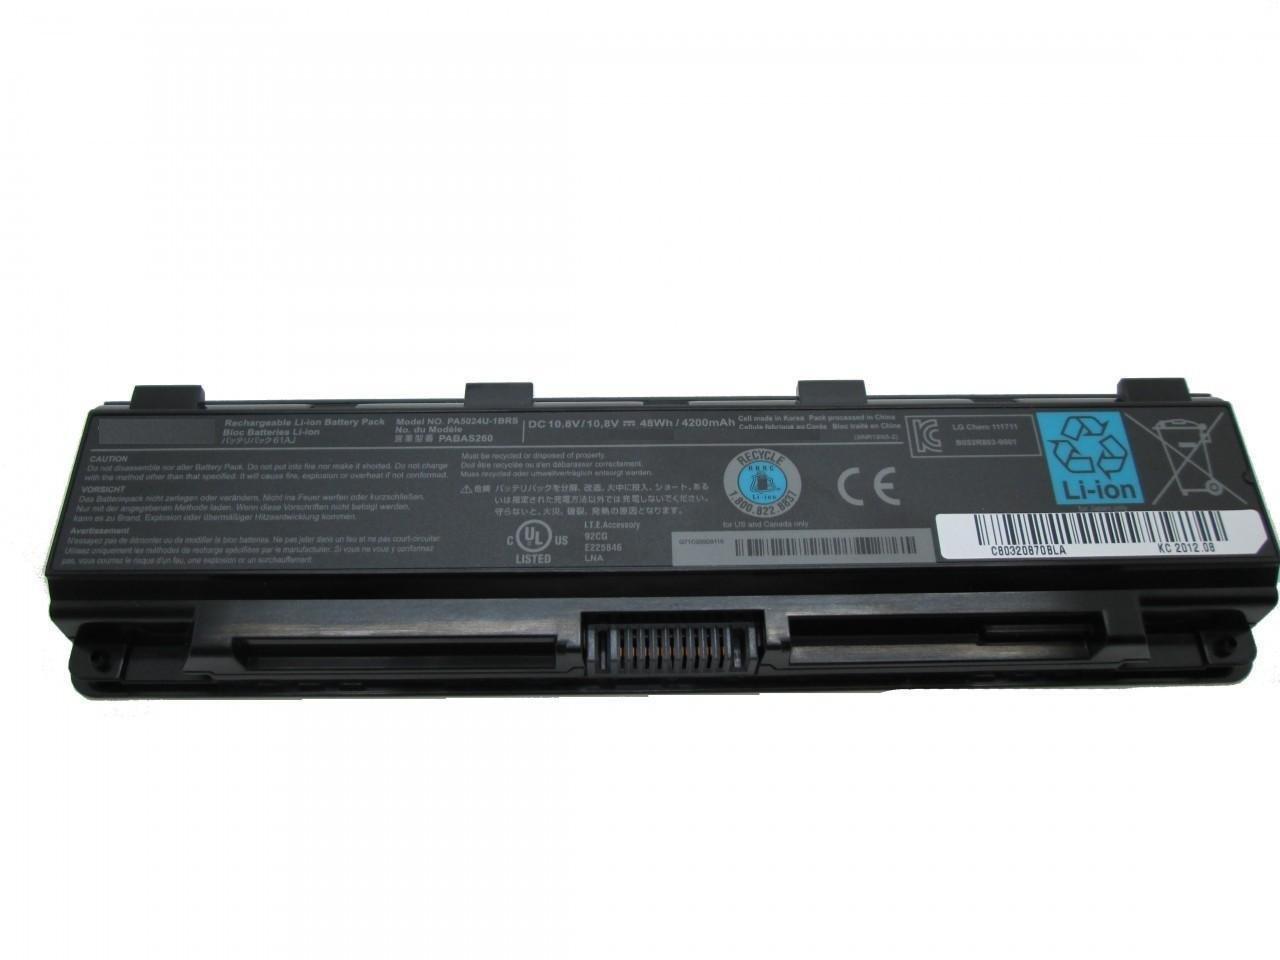 Toshiba S75t S850 S855 S855D S870 S875 S875D compatible laptop battery